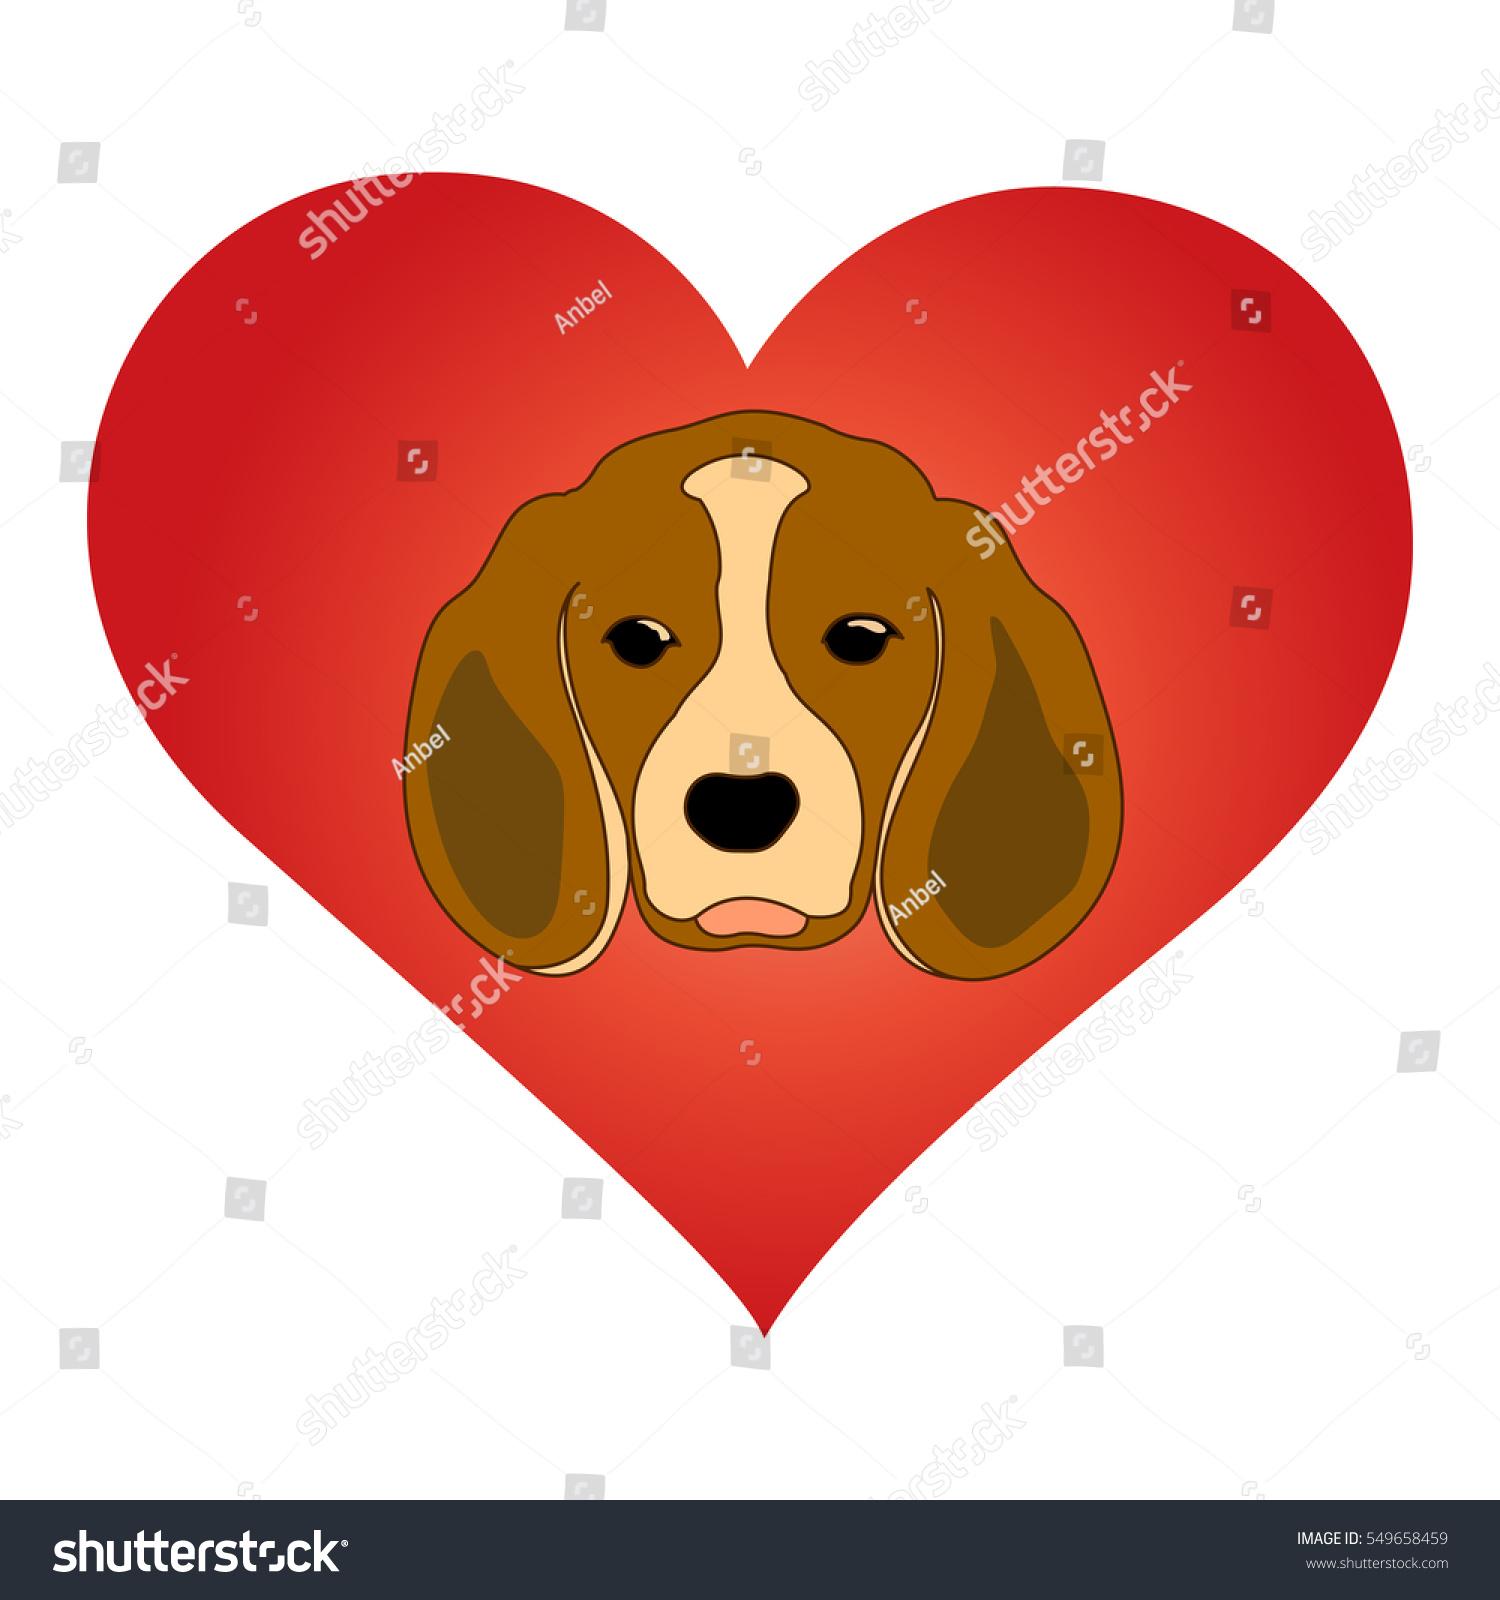 Love My Dog Animal Love Symbol Stock Vector Royalty Free 549658459